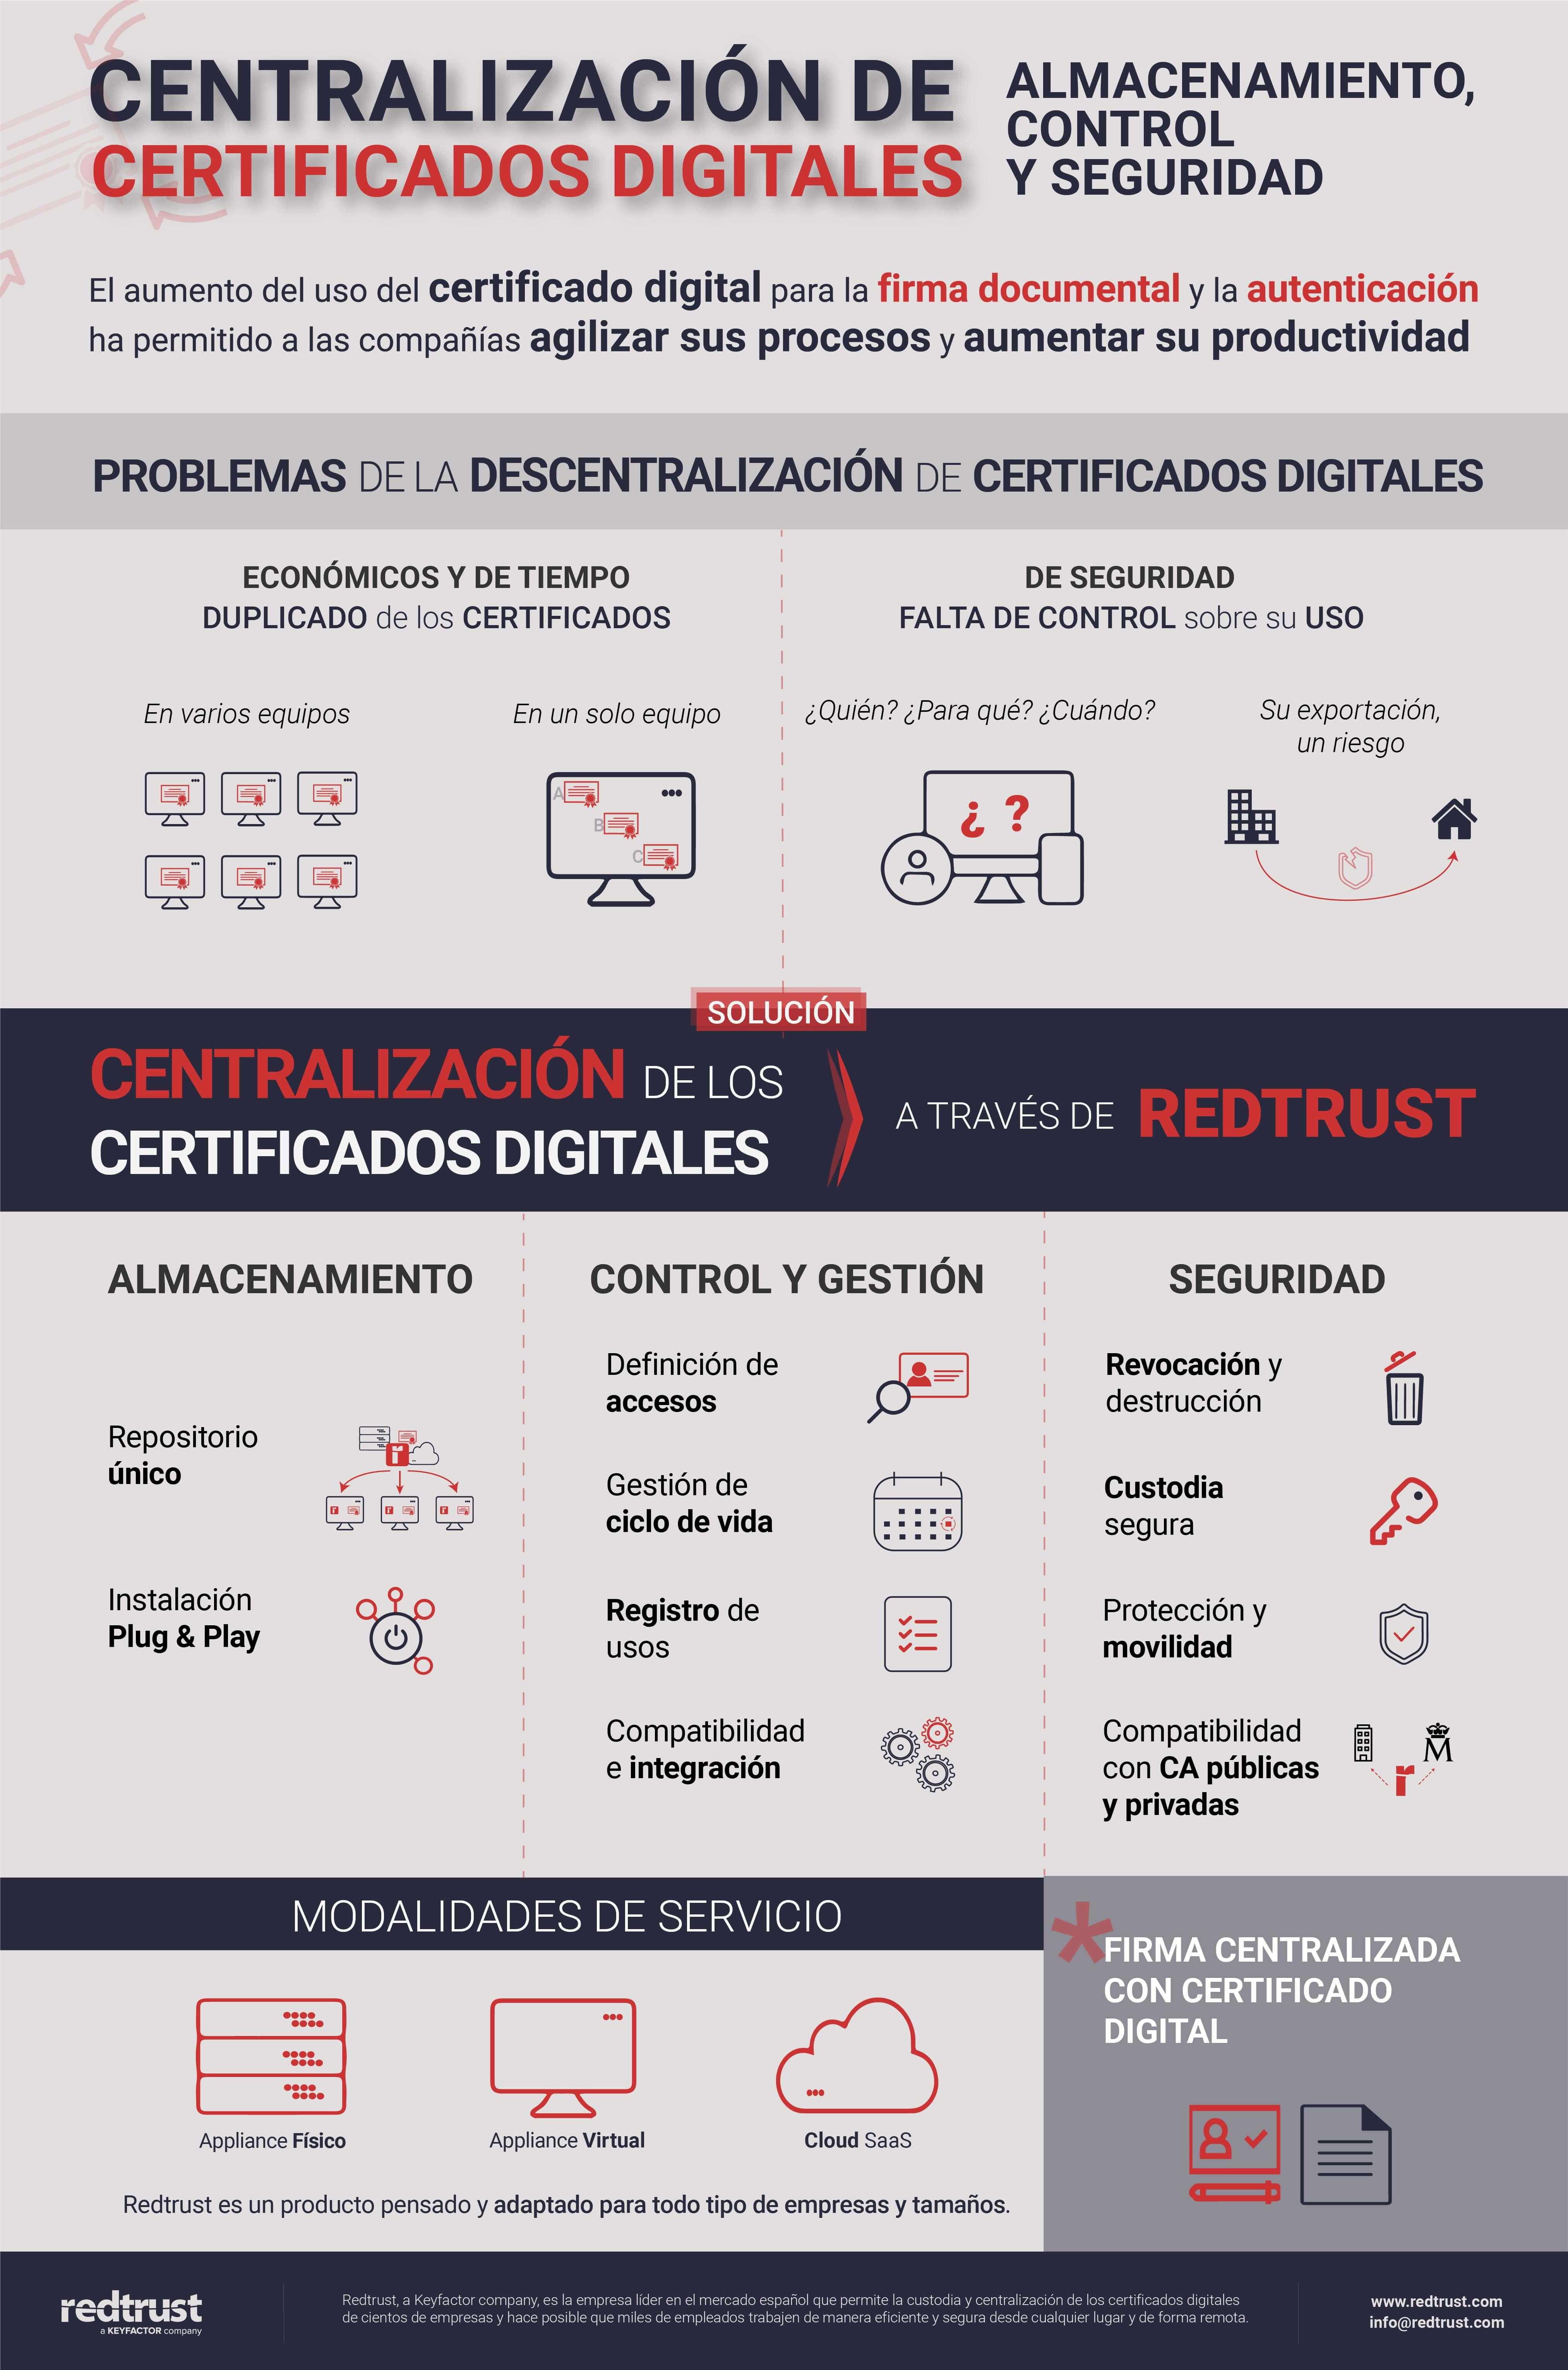 centralizacion-certificados-digitales-redtrust-infografia